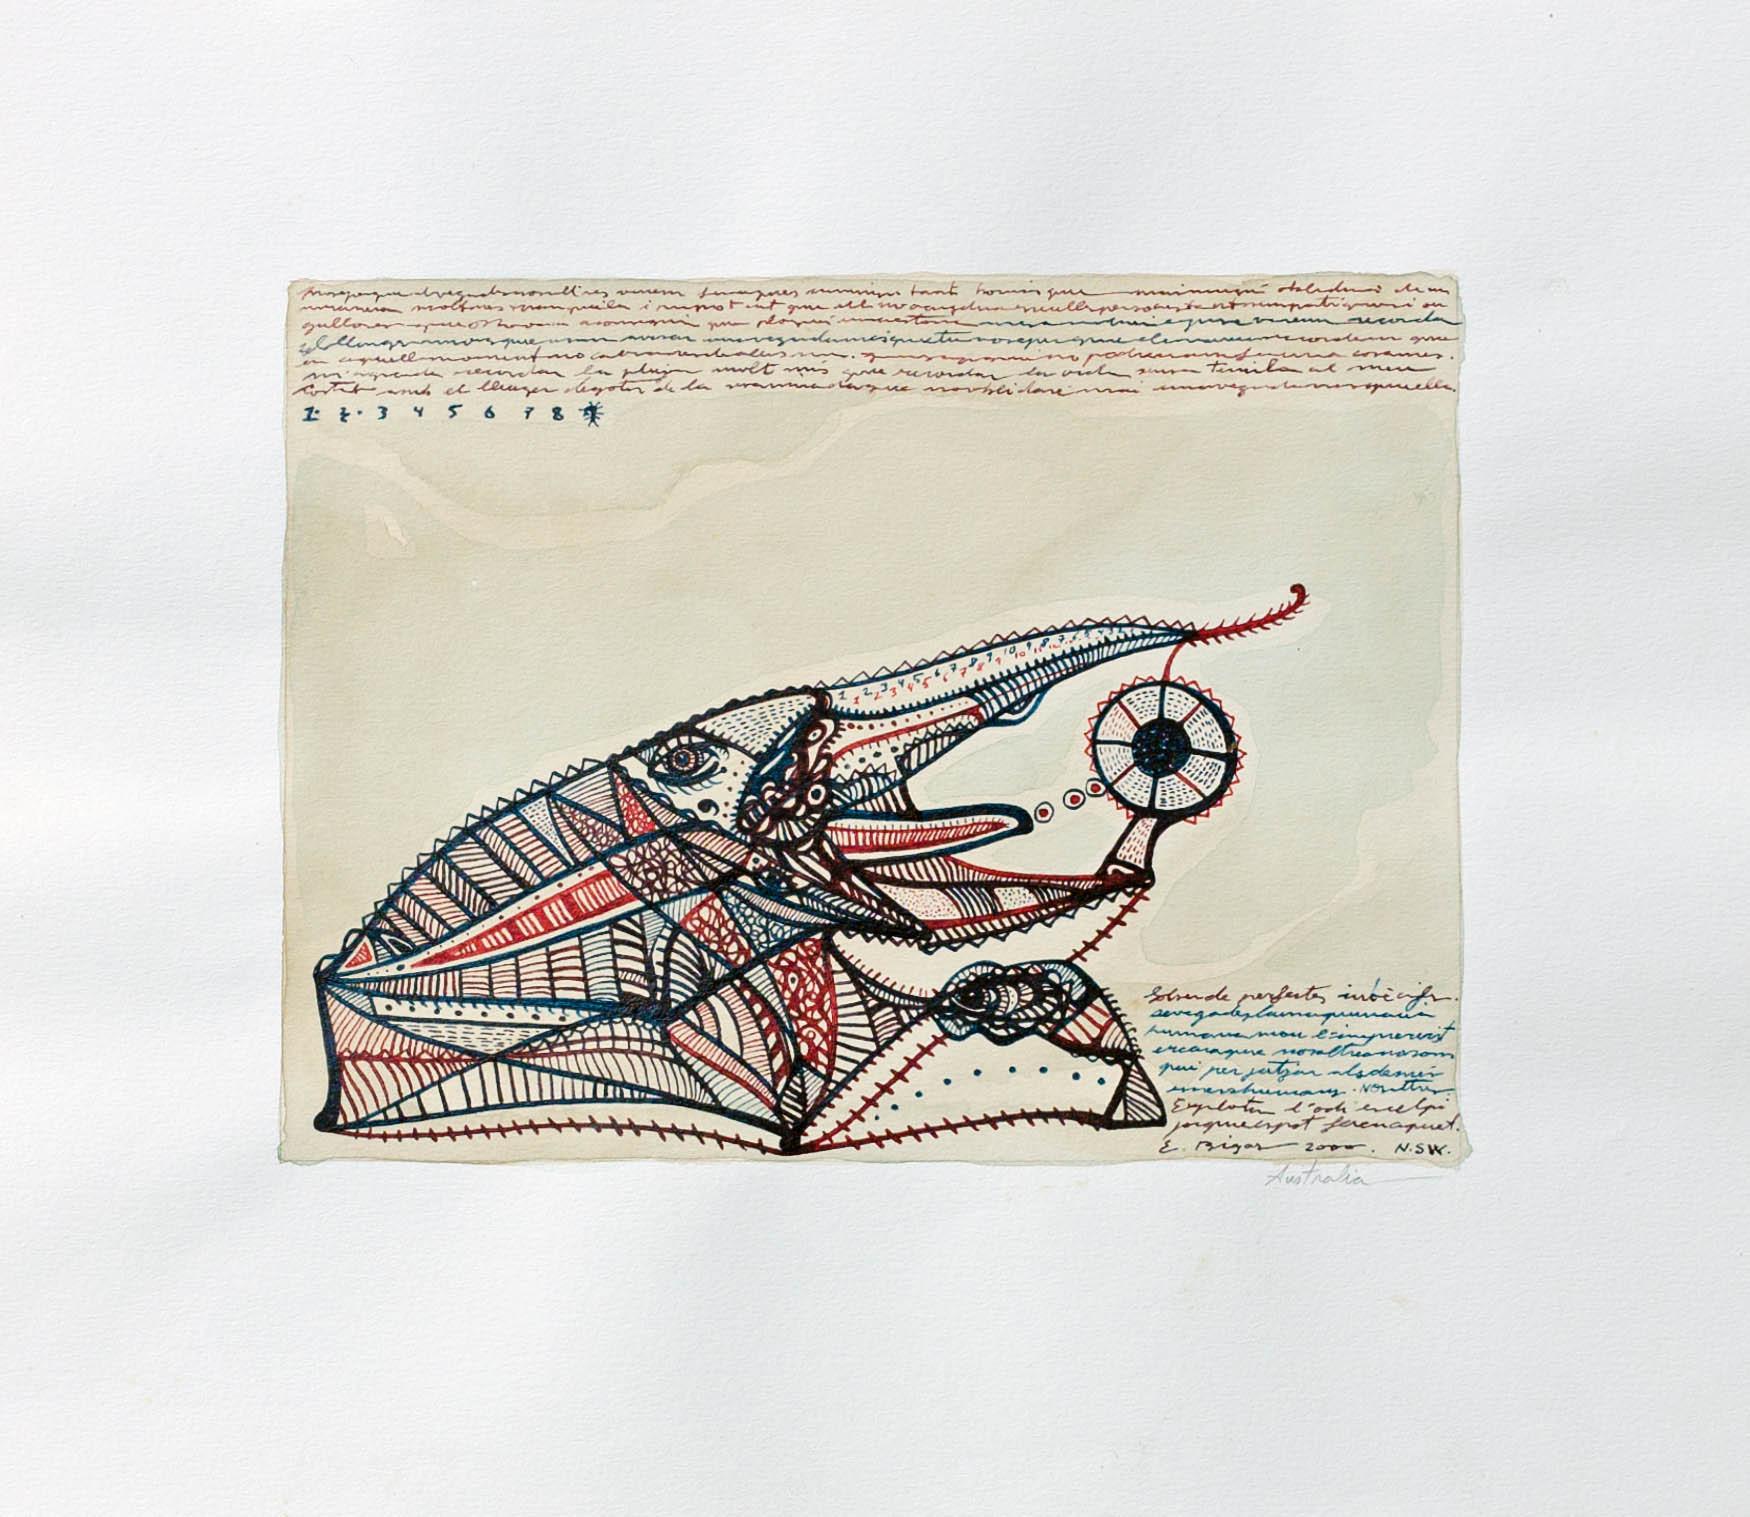 Australia 2000 27'5x24cm. Tea, watercolour and Ink on paper